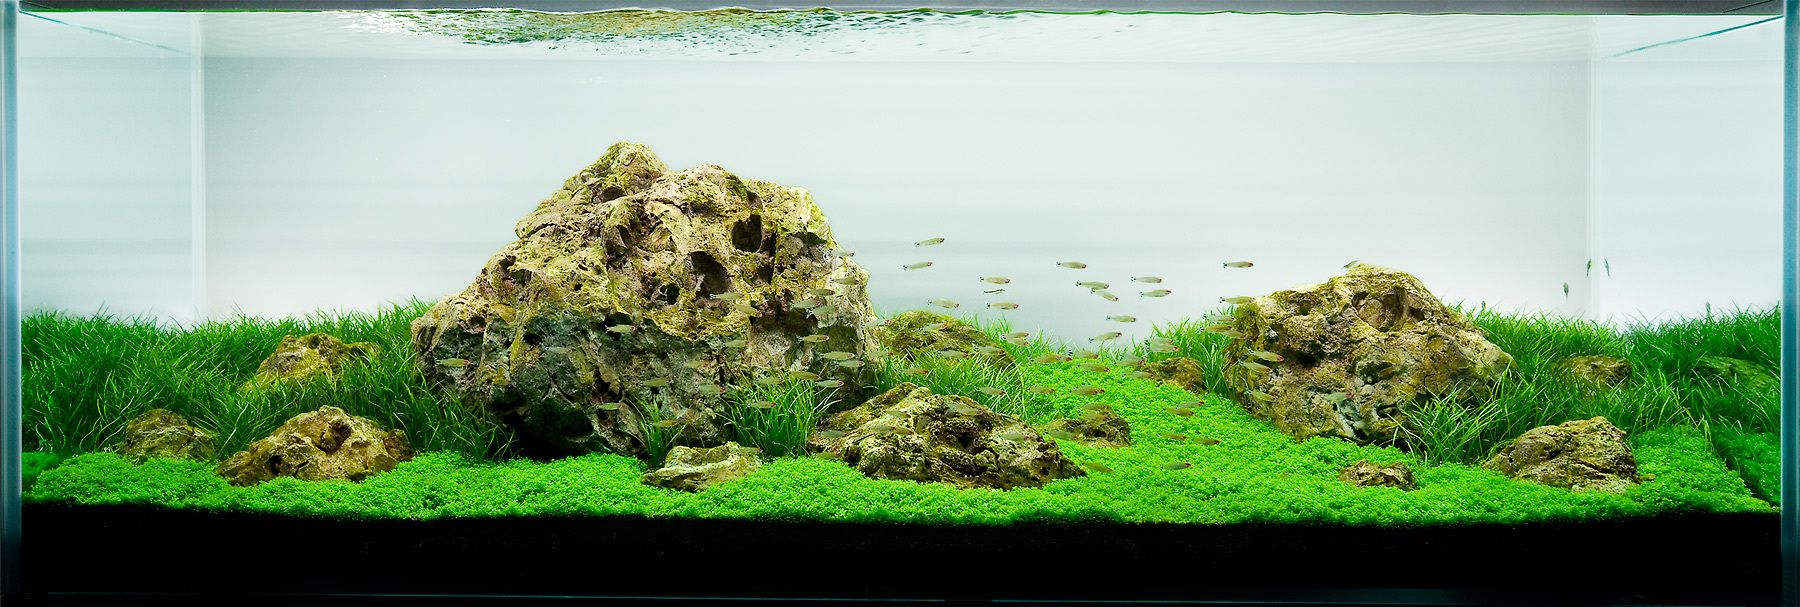 Dragon Stone Aquascape Aquascaping Planted Tanks Aquariums